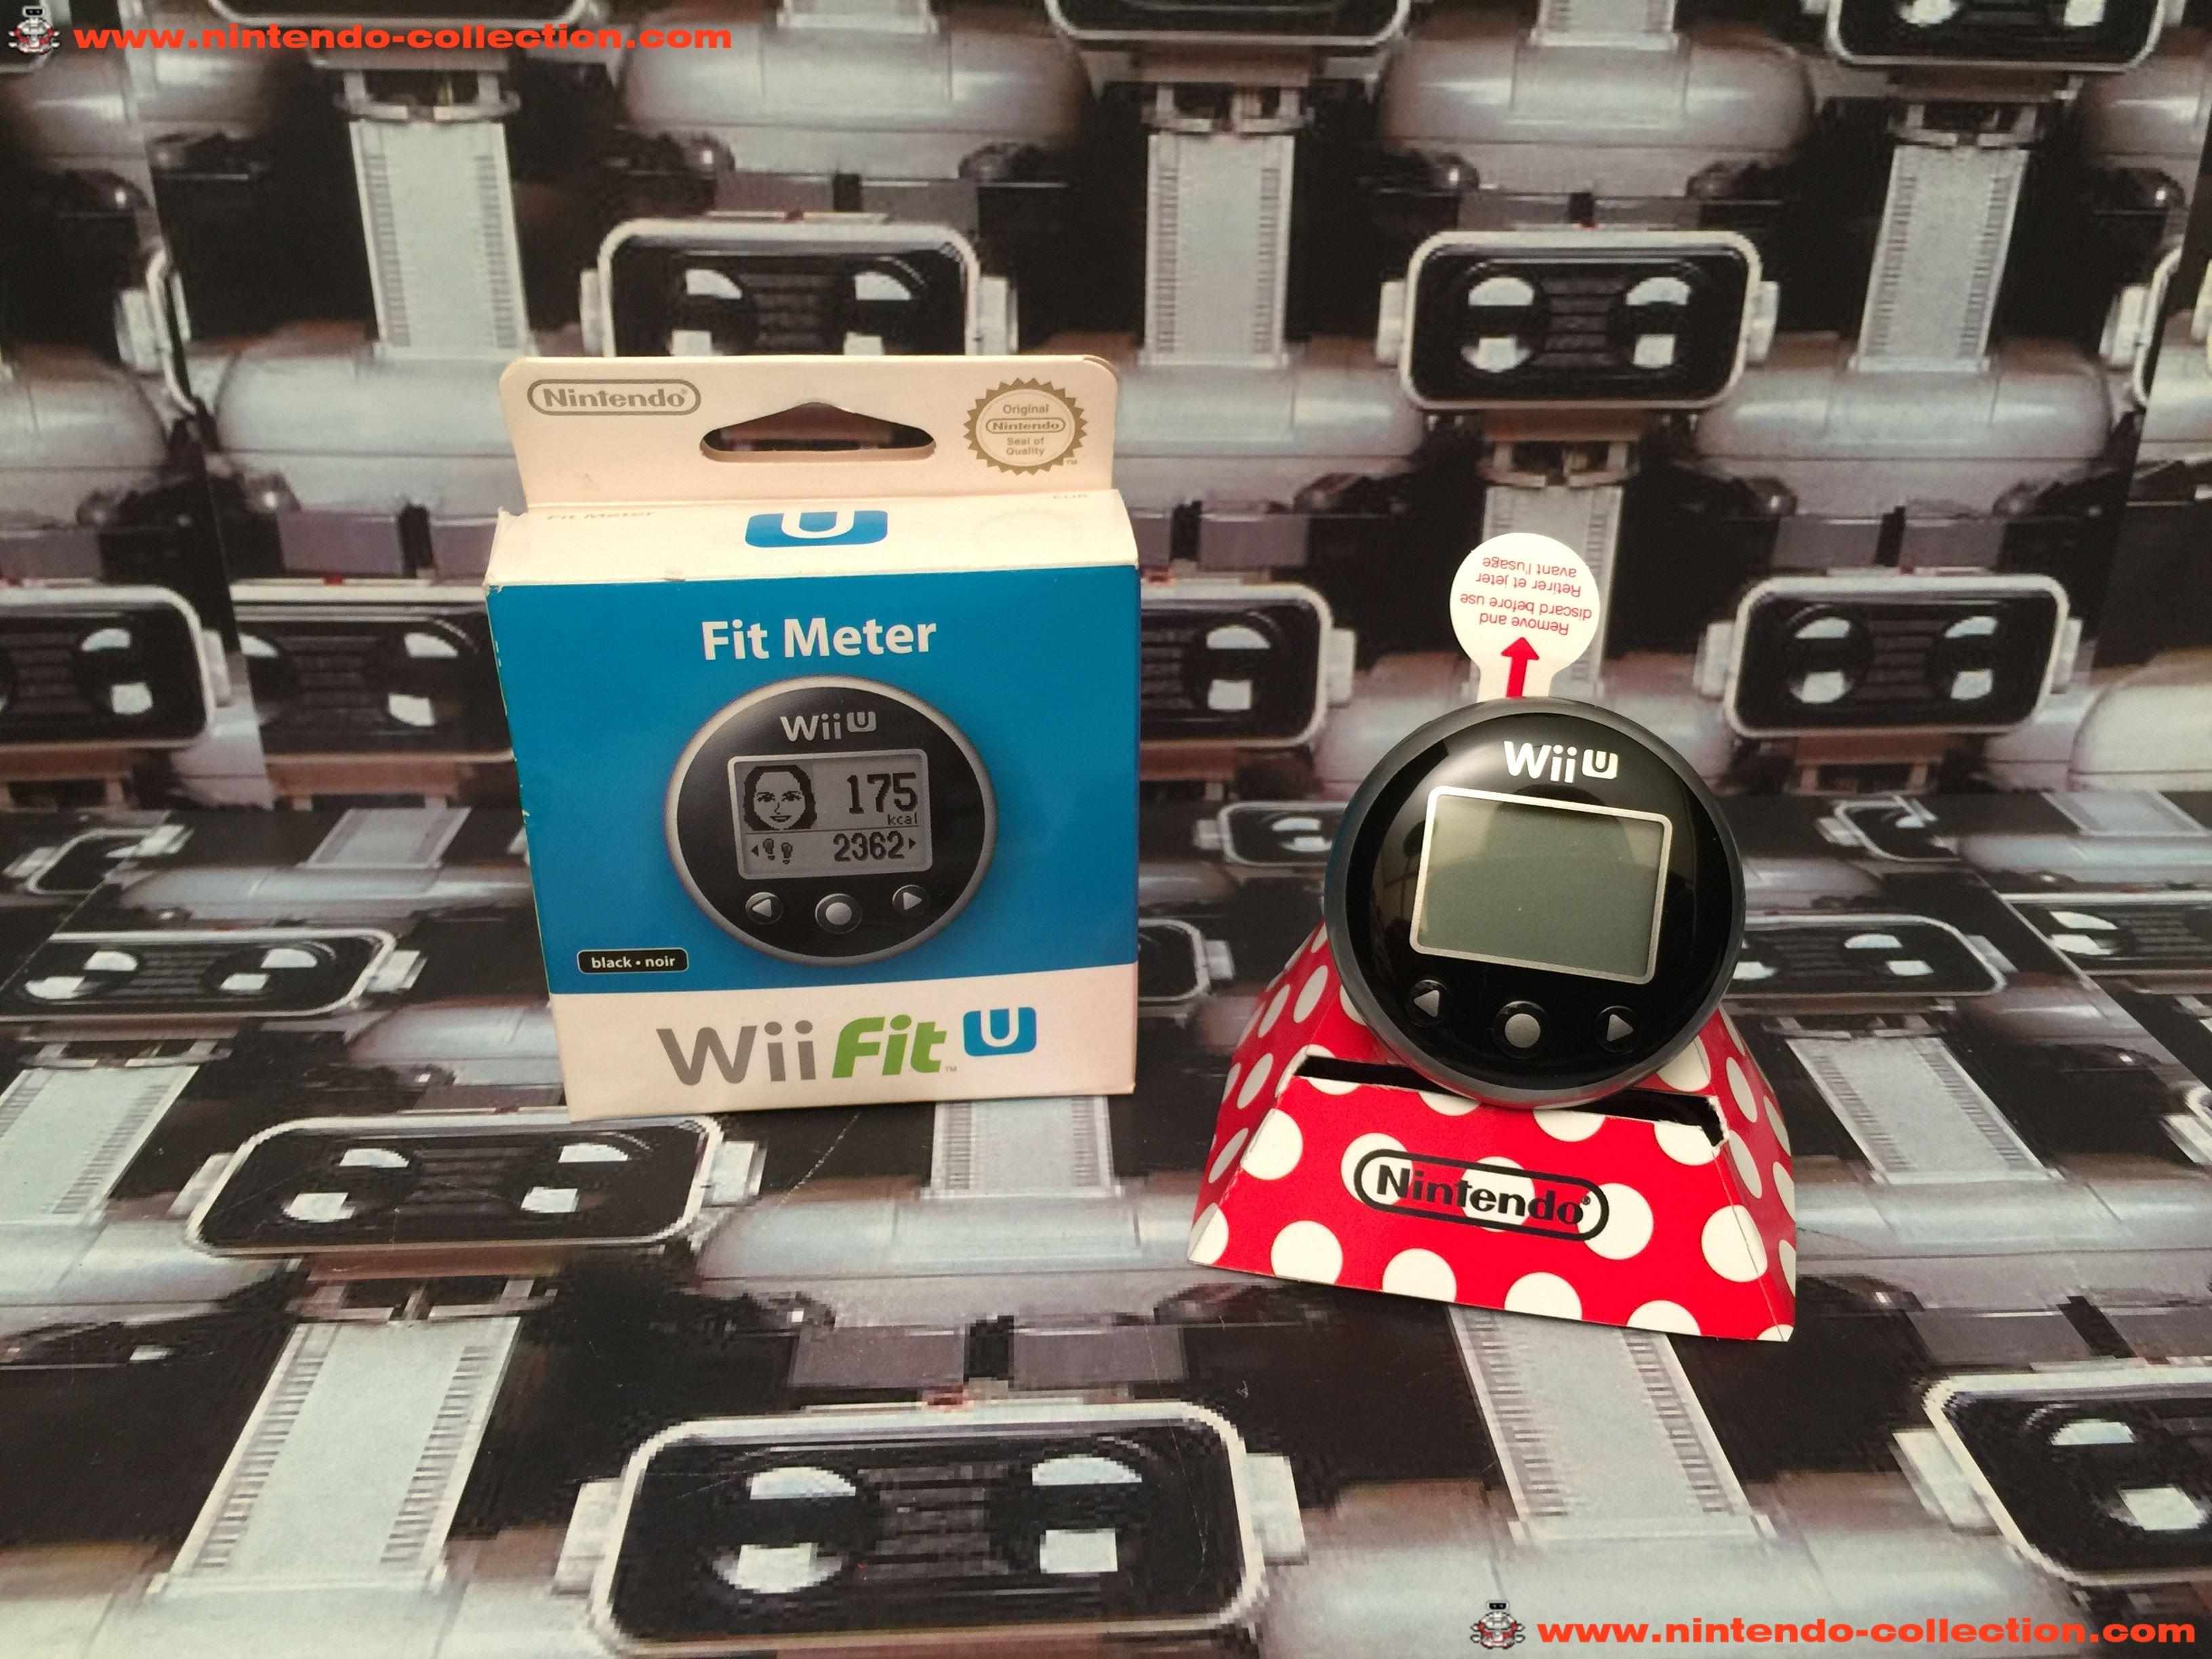 www.nintendo-collection.com - Wii U Mini Nintendo Wii Fit Meter Black Noir